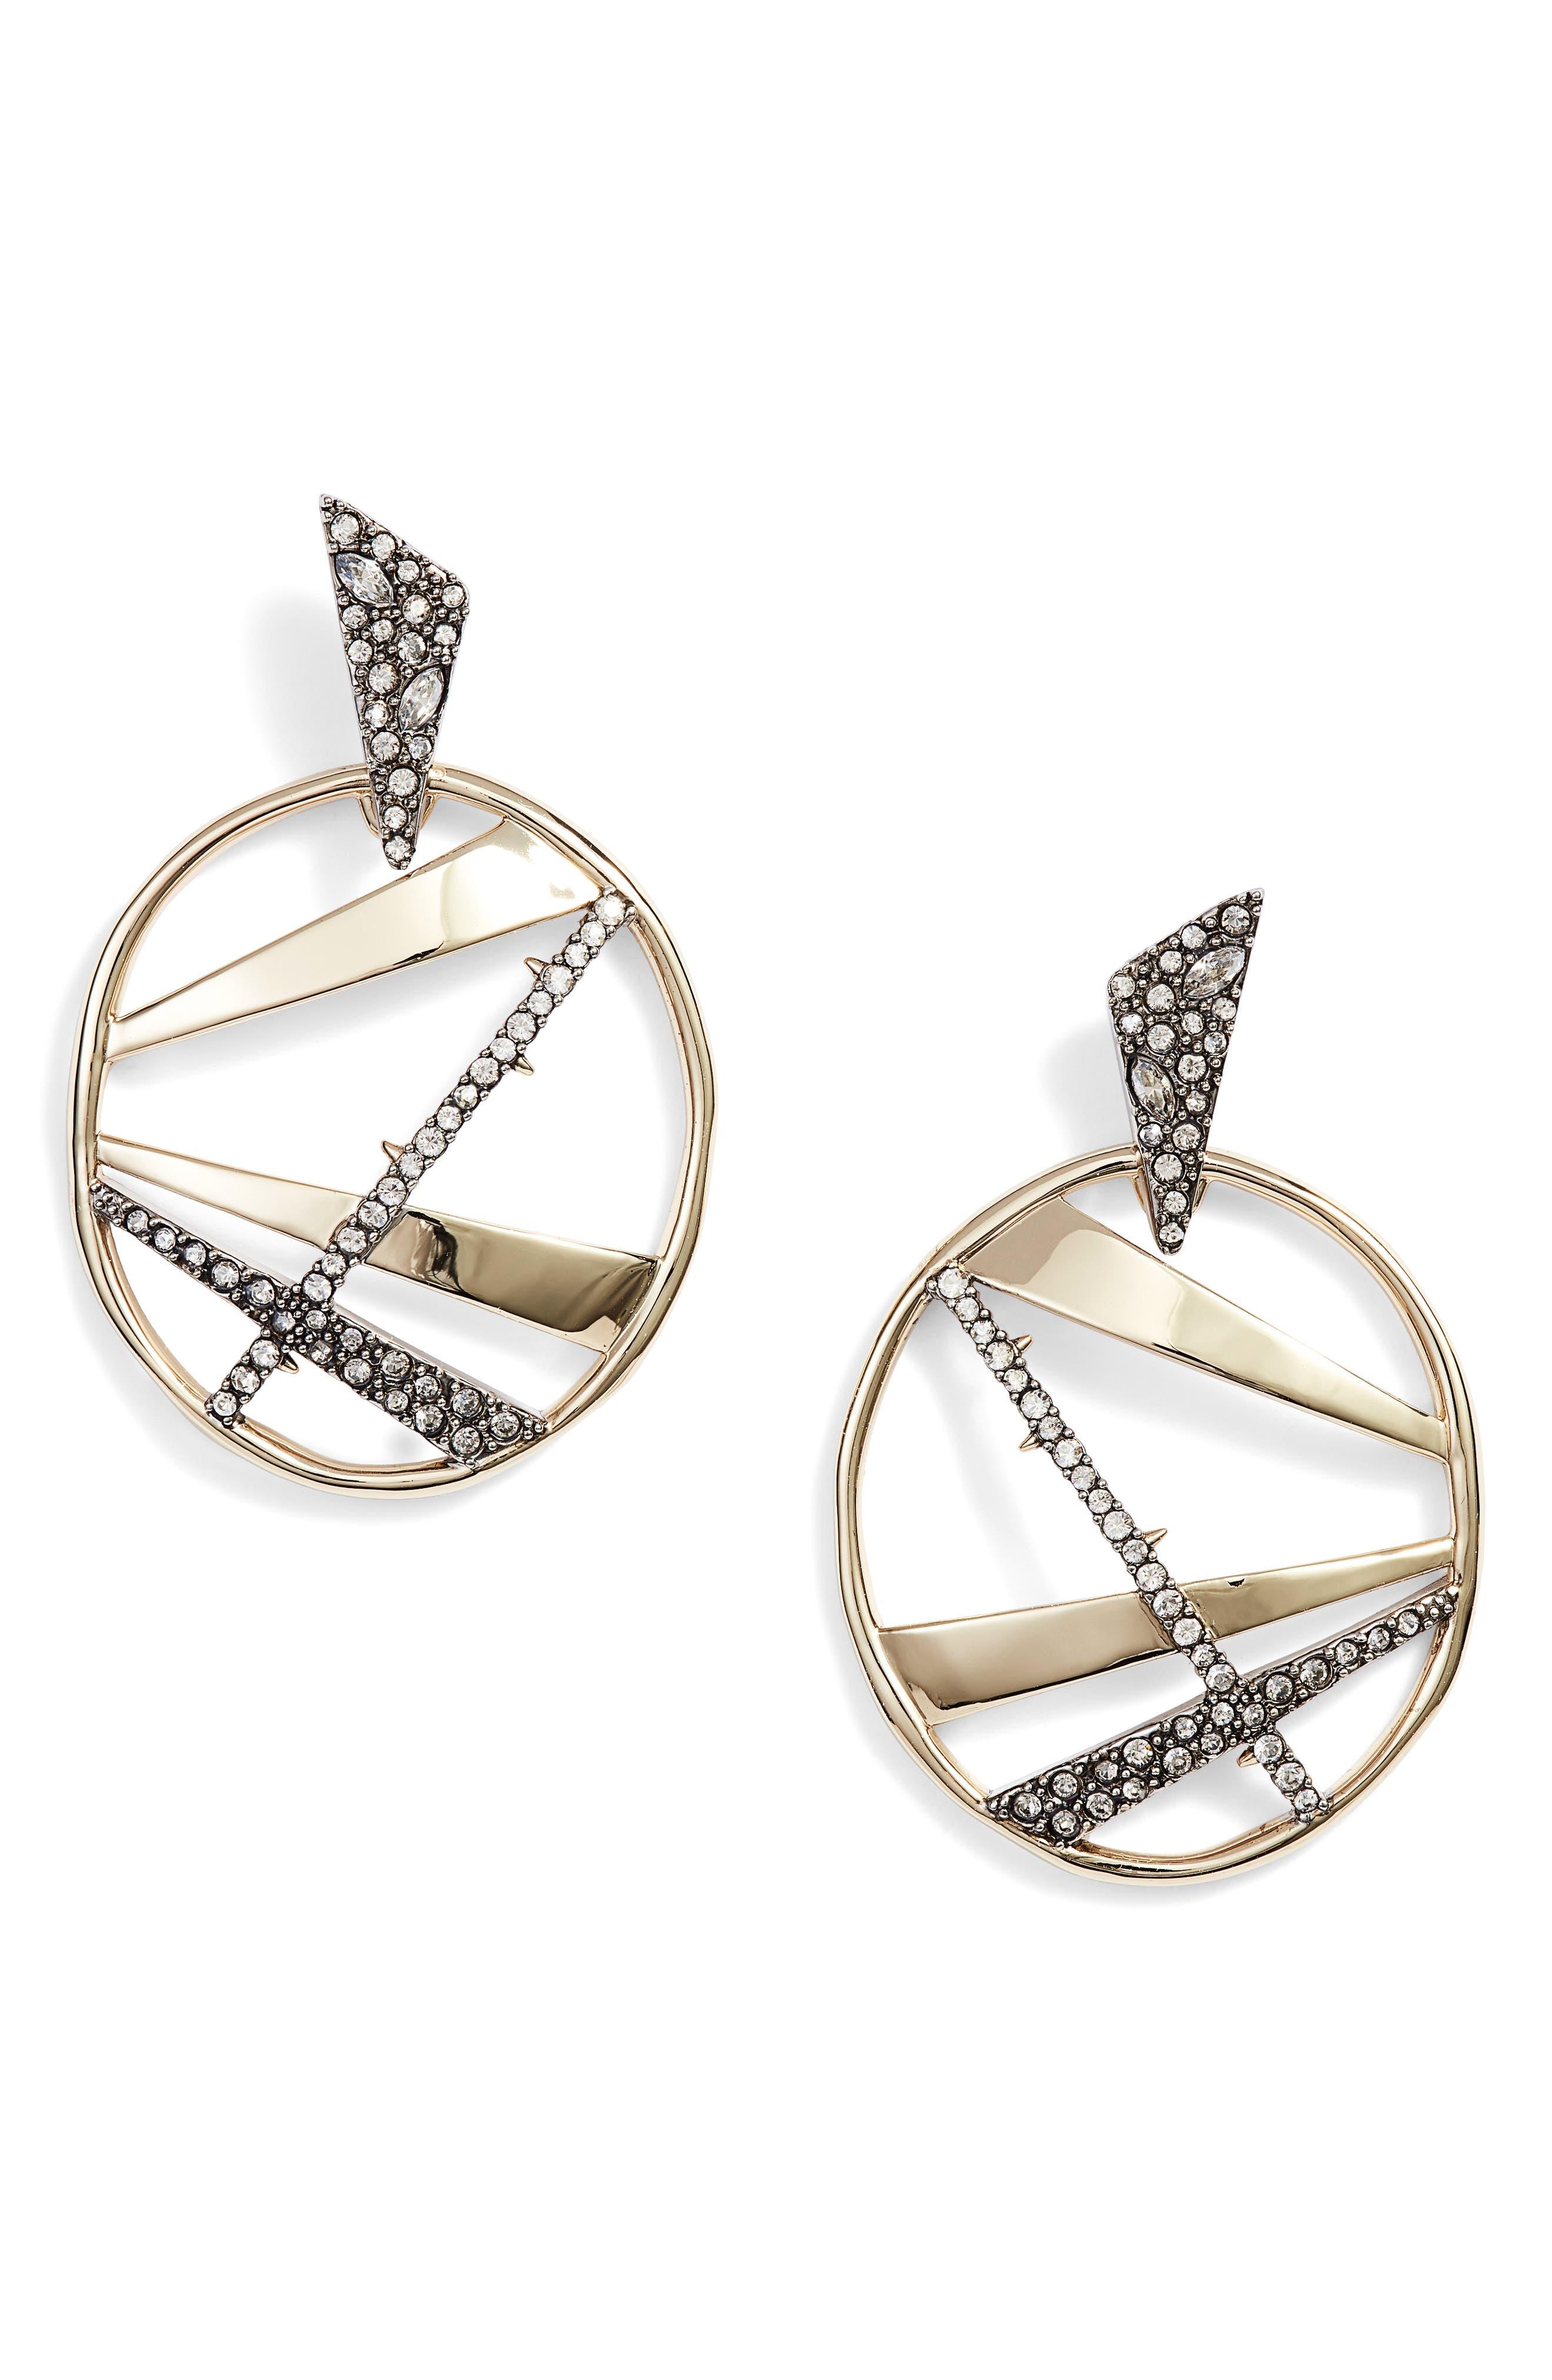 Large Crystal Encrusted Plaid Hoop Earrings,                             Main thumbnail 1, color,                             Gold/ Silver